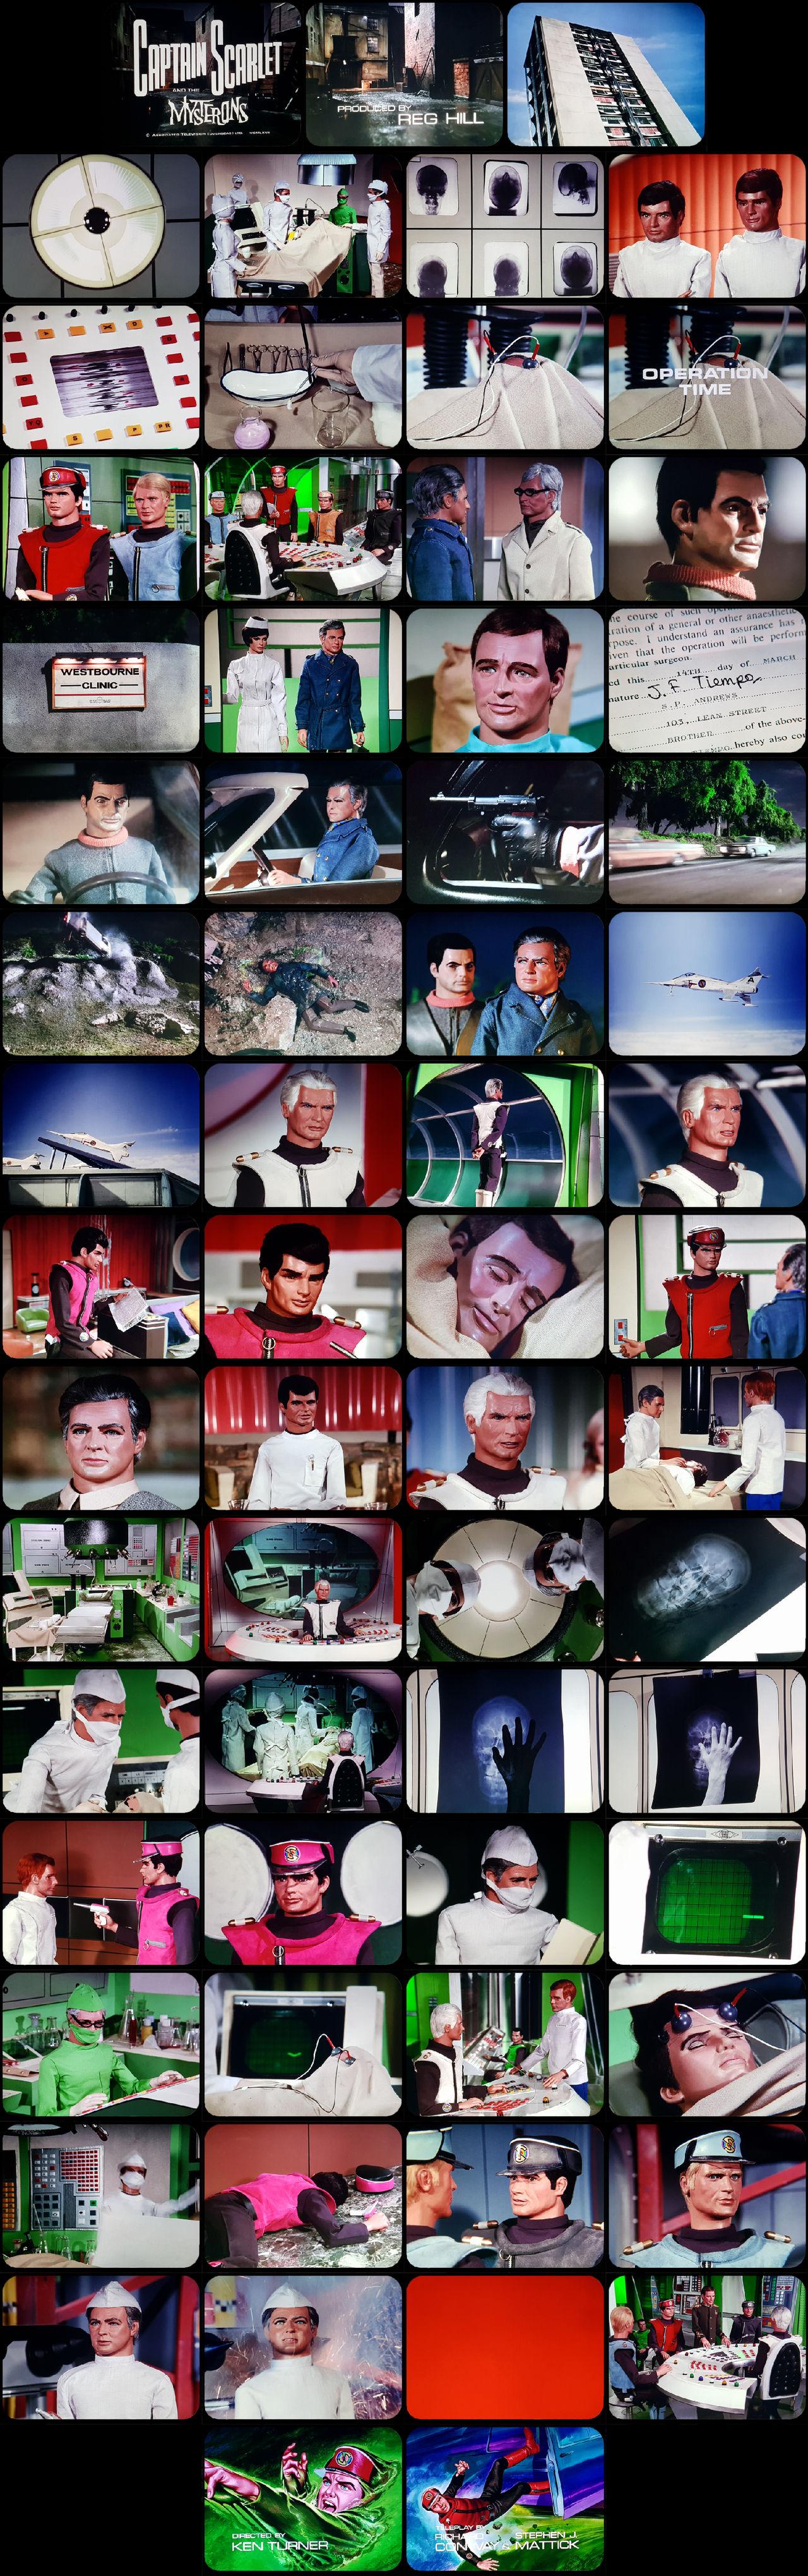 Captain Scarlet Episode 6 Tele-Snaps (REDONE)